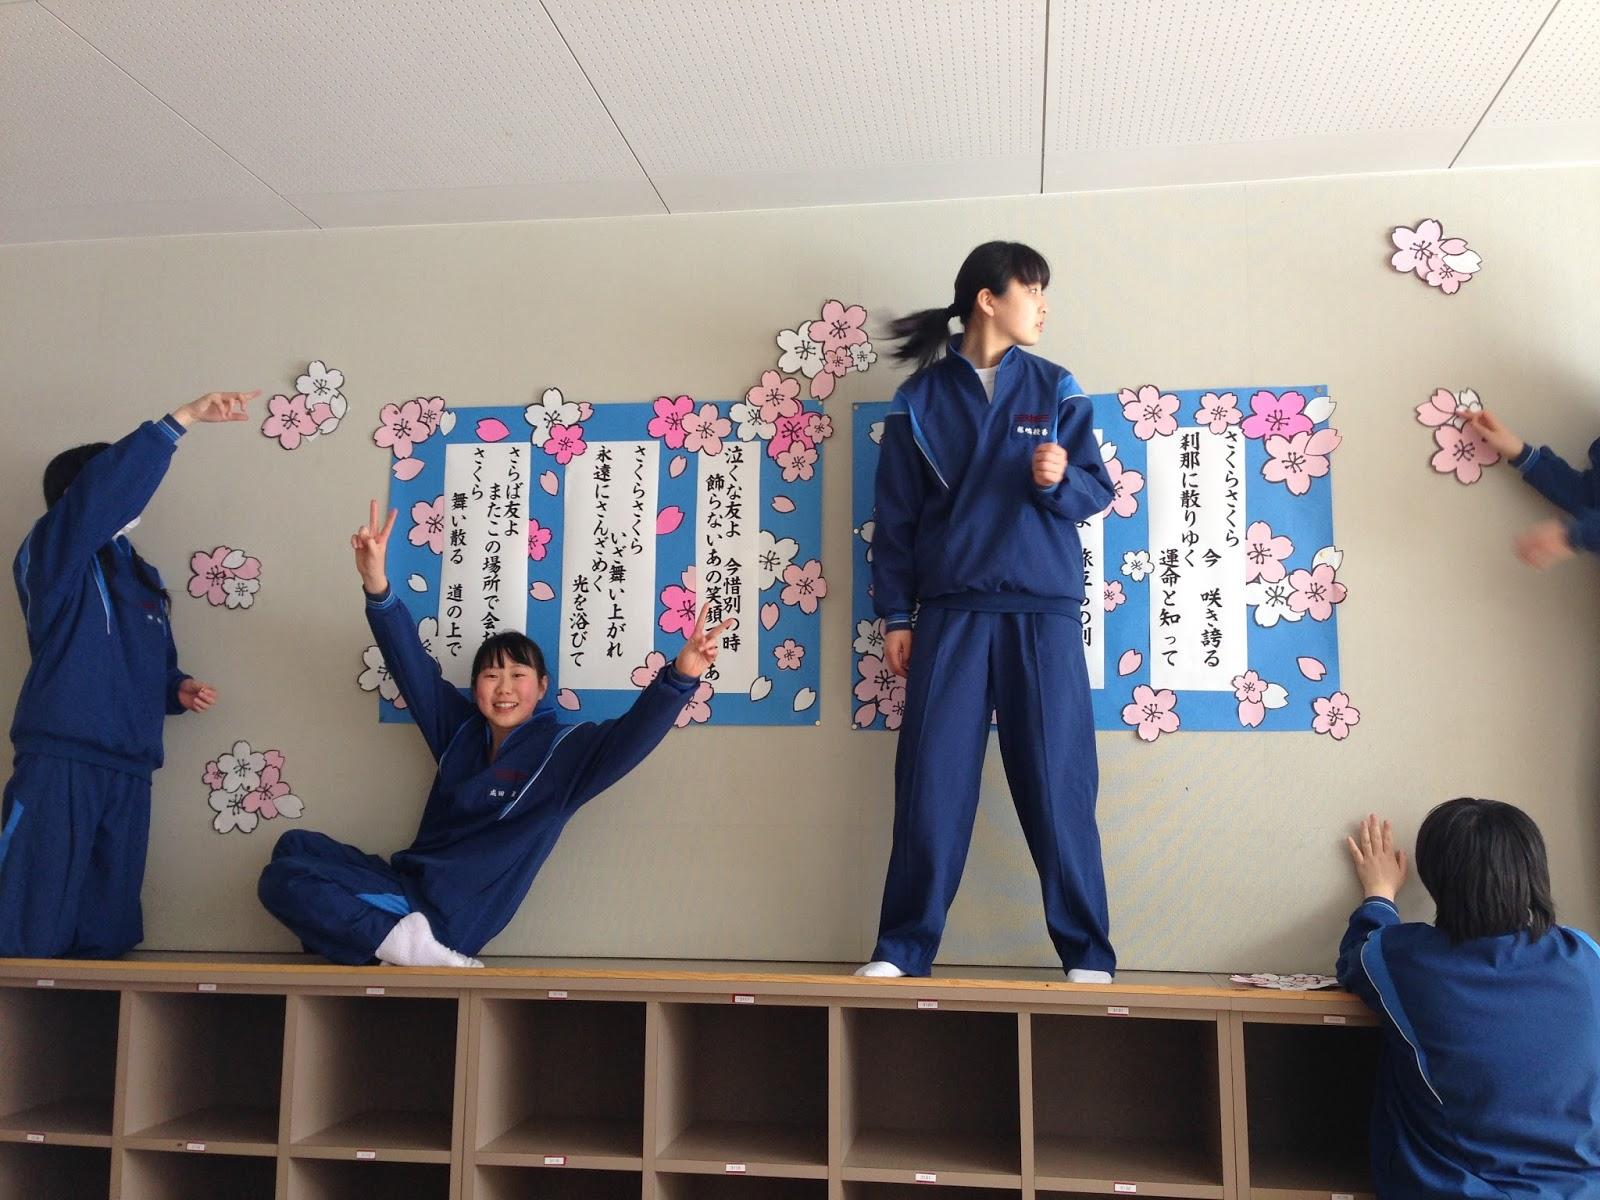 Japanese Classroom Decor ~ High school graduation ceremony decorations party people